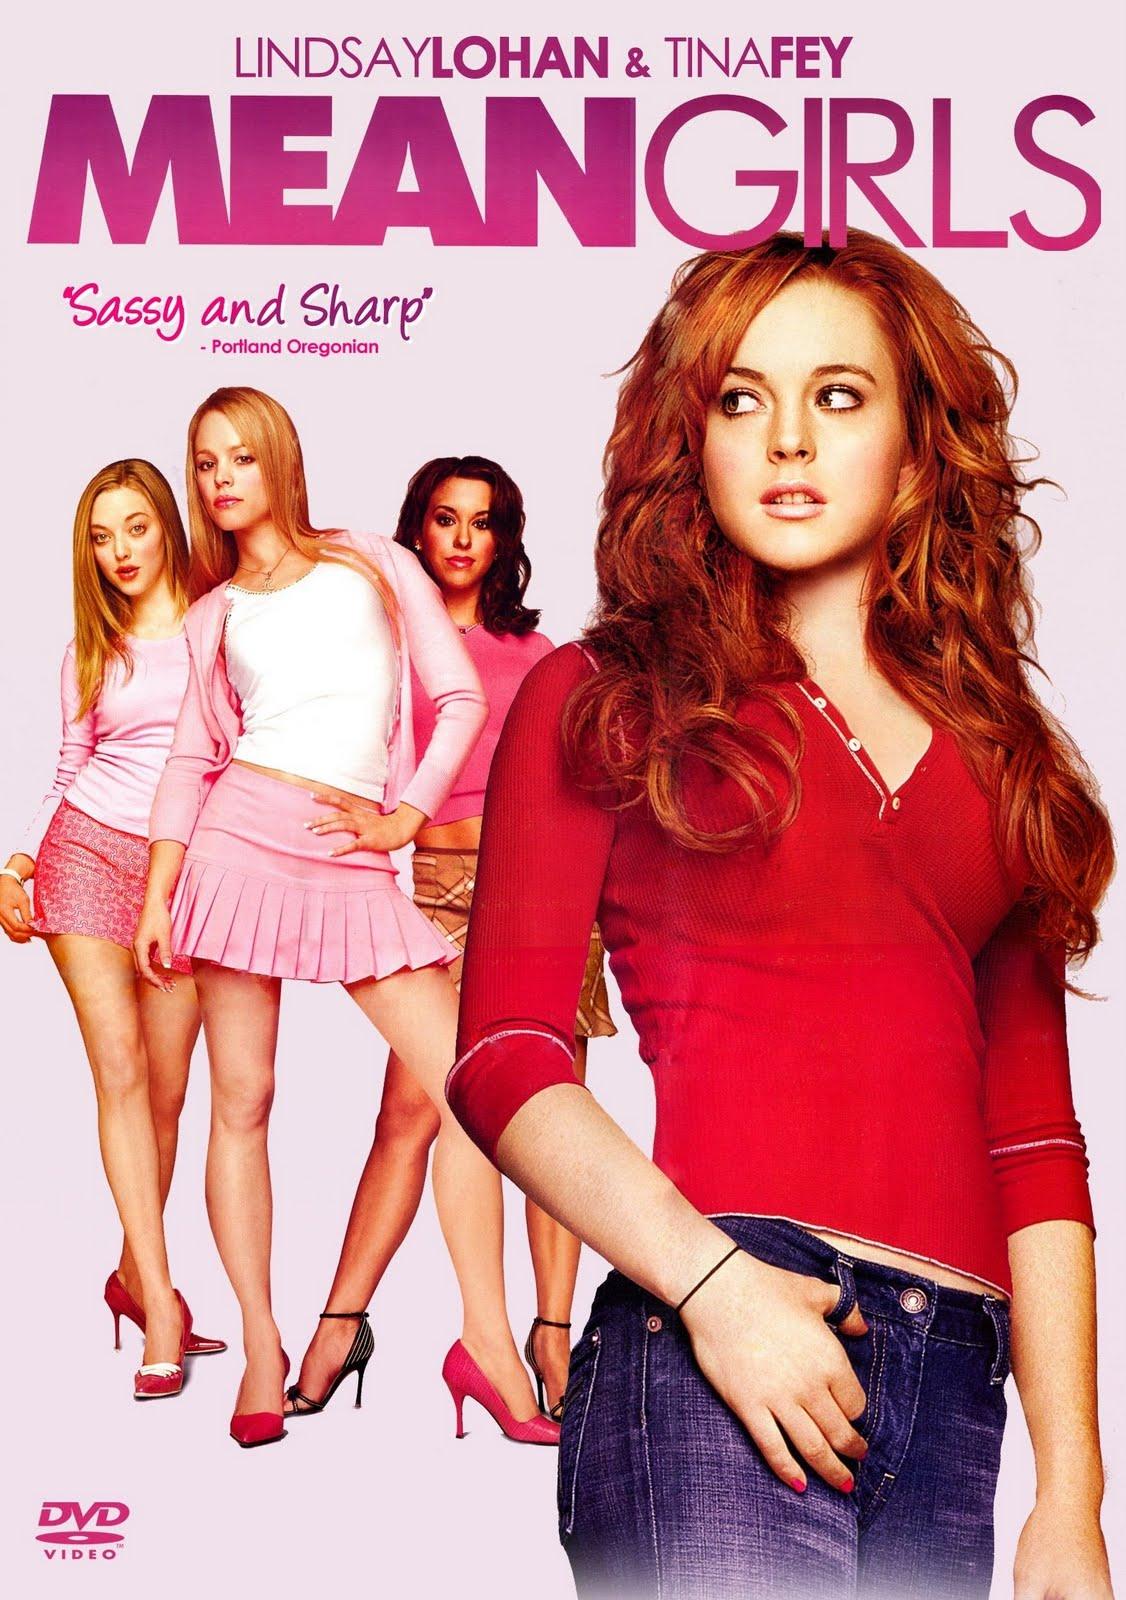 Mean Girls (2004)dvdplanetstorepk